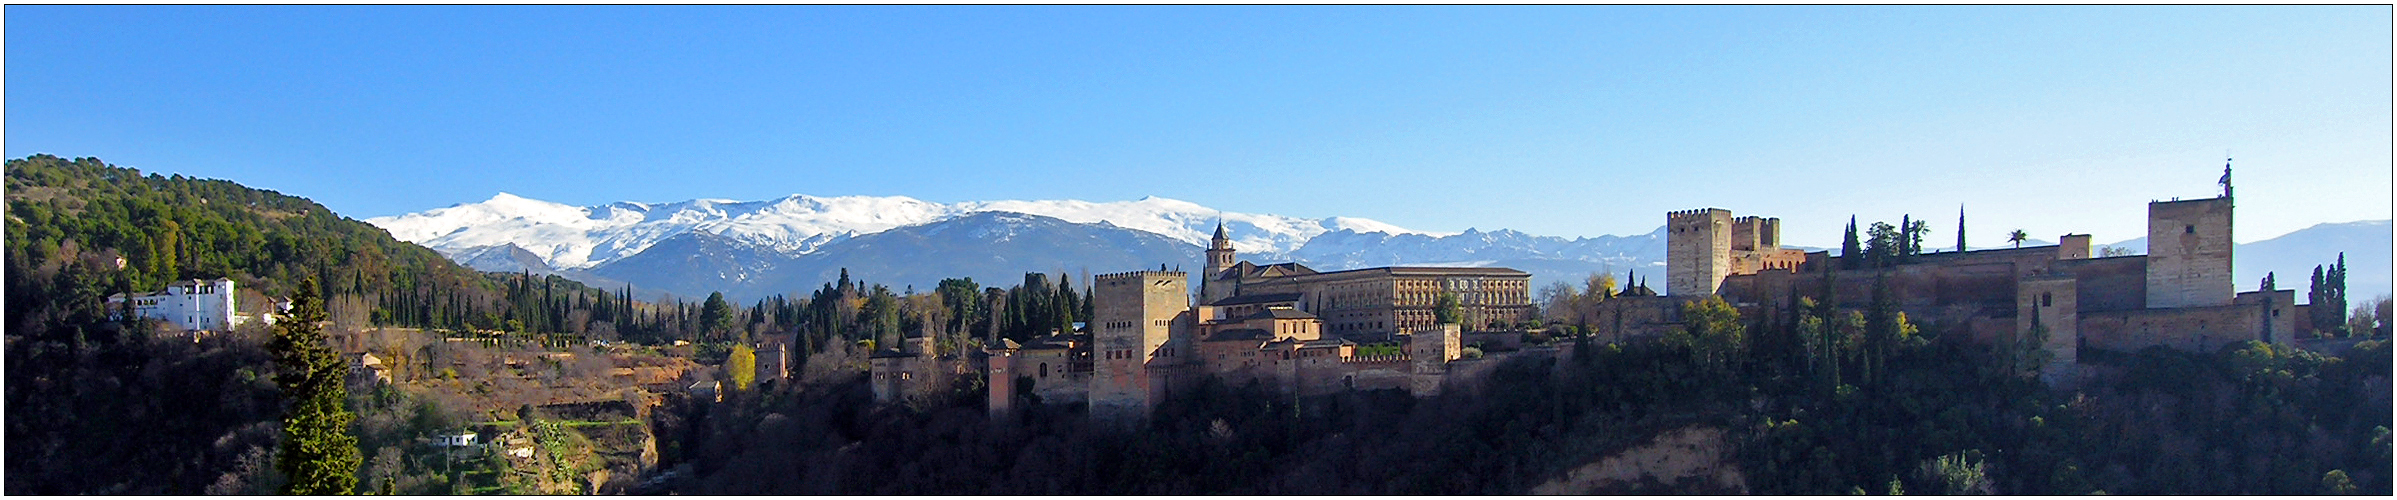 Alhambrorama